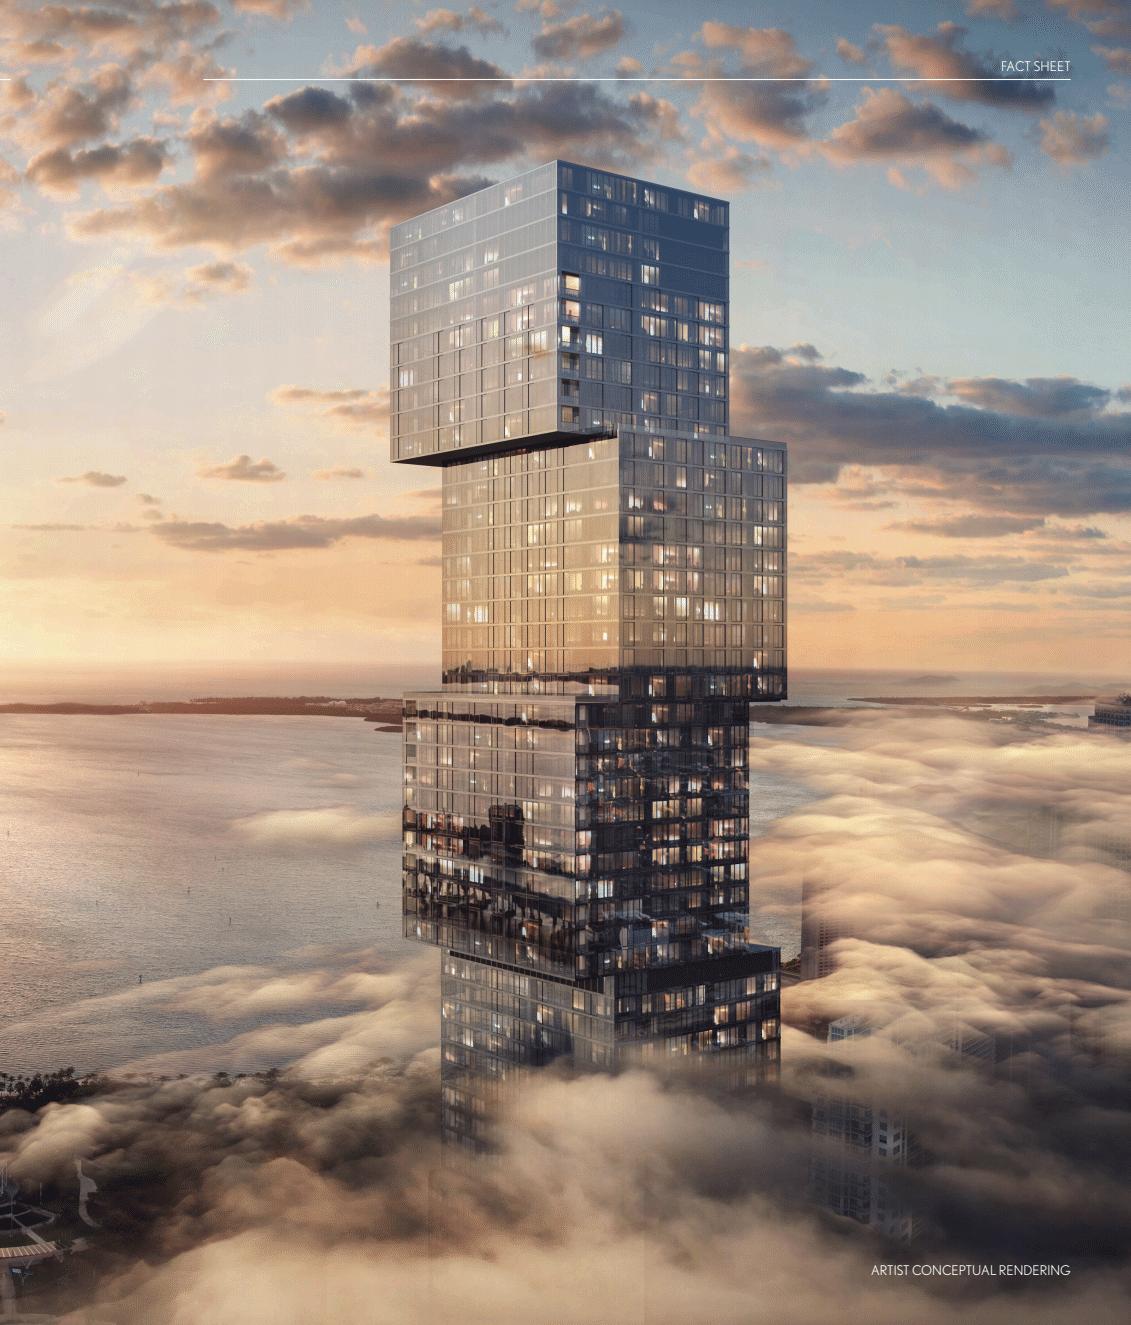 skyview image of Waldorf Astoria